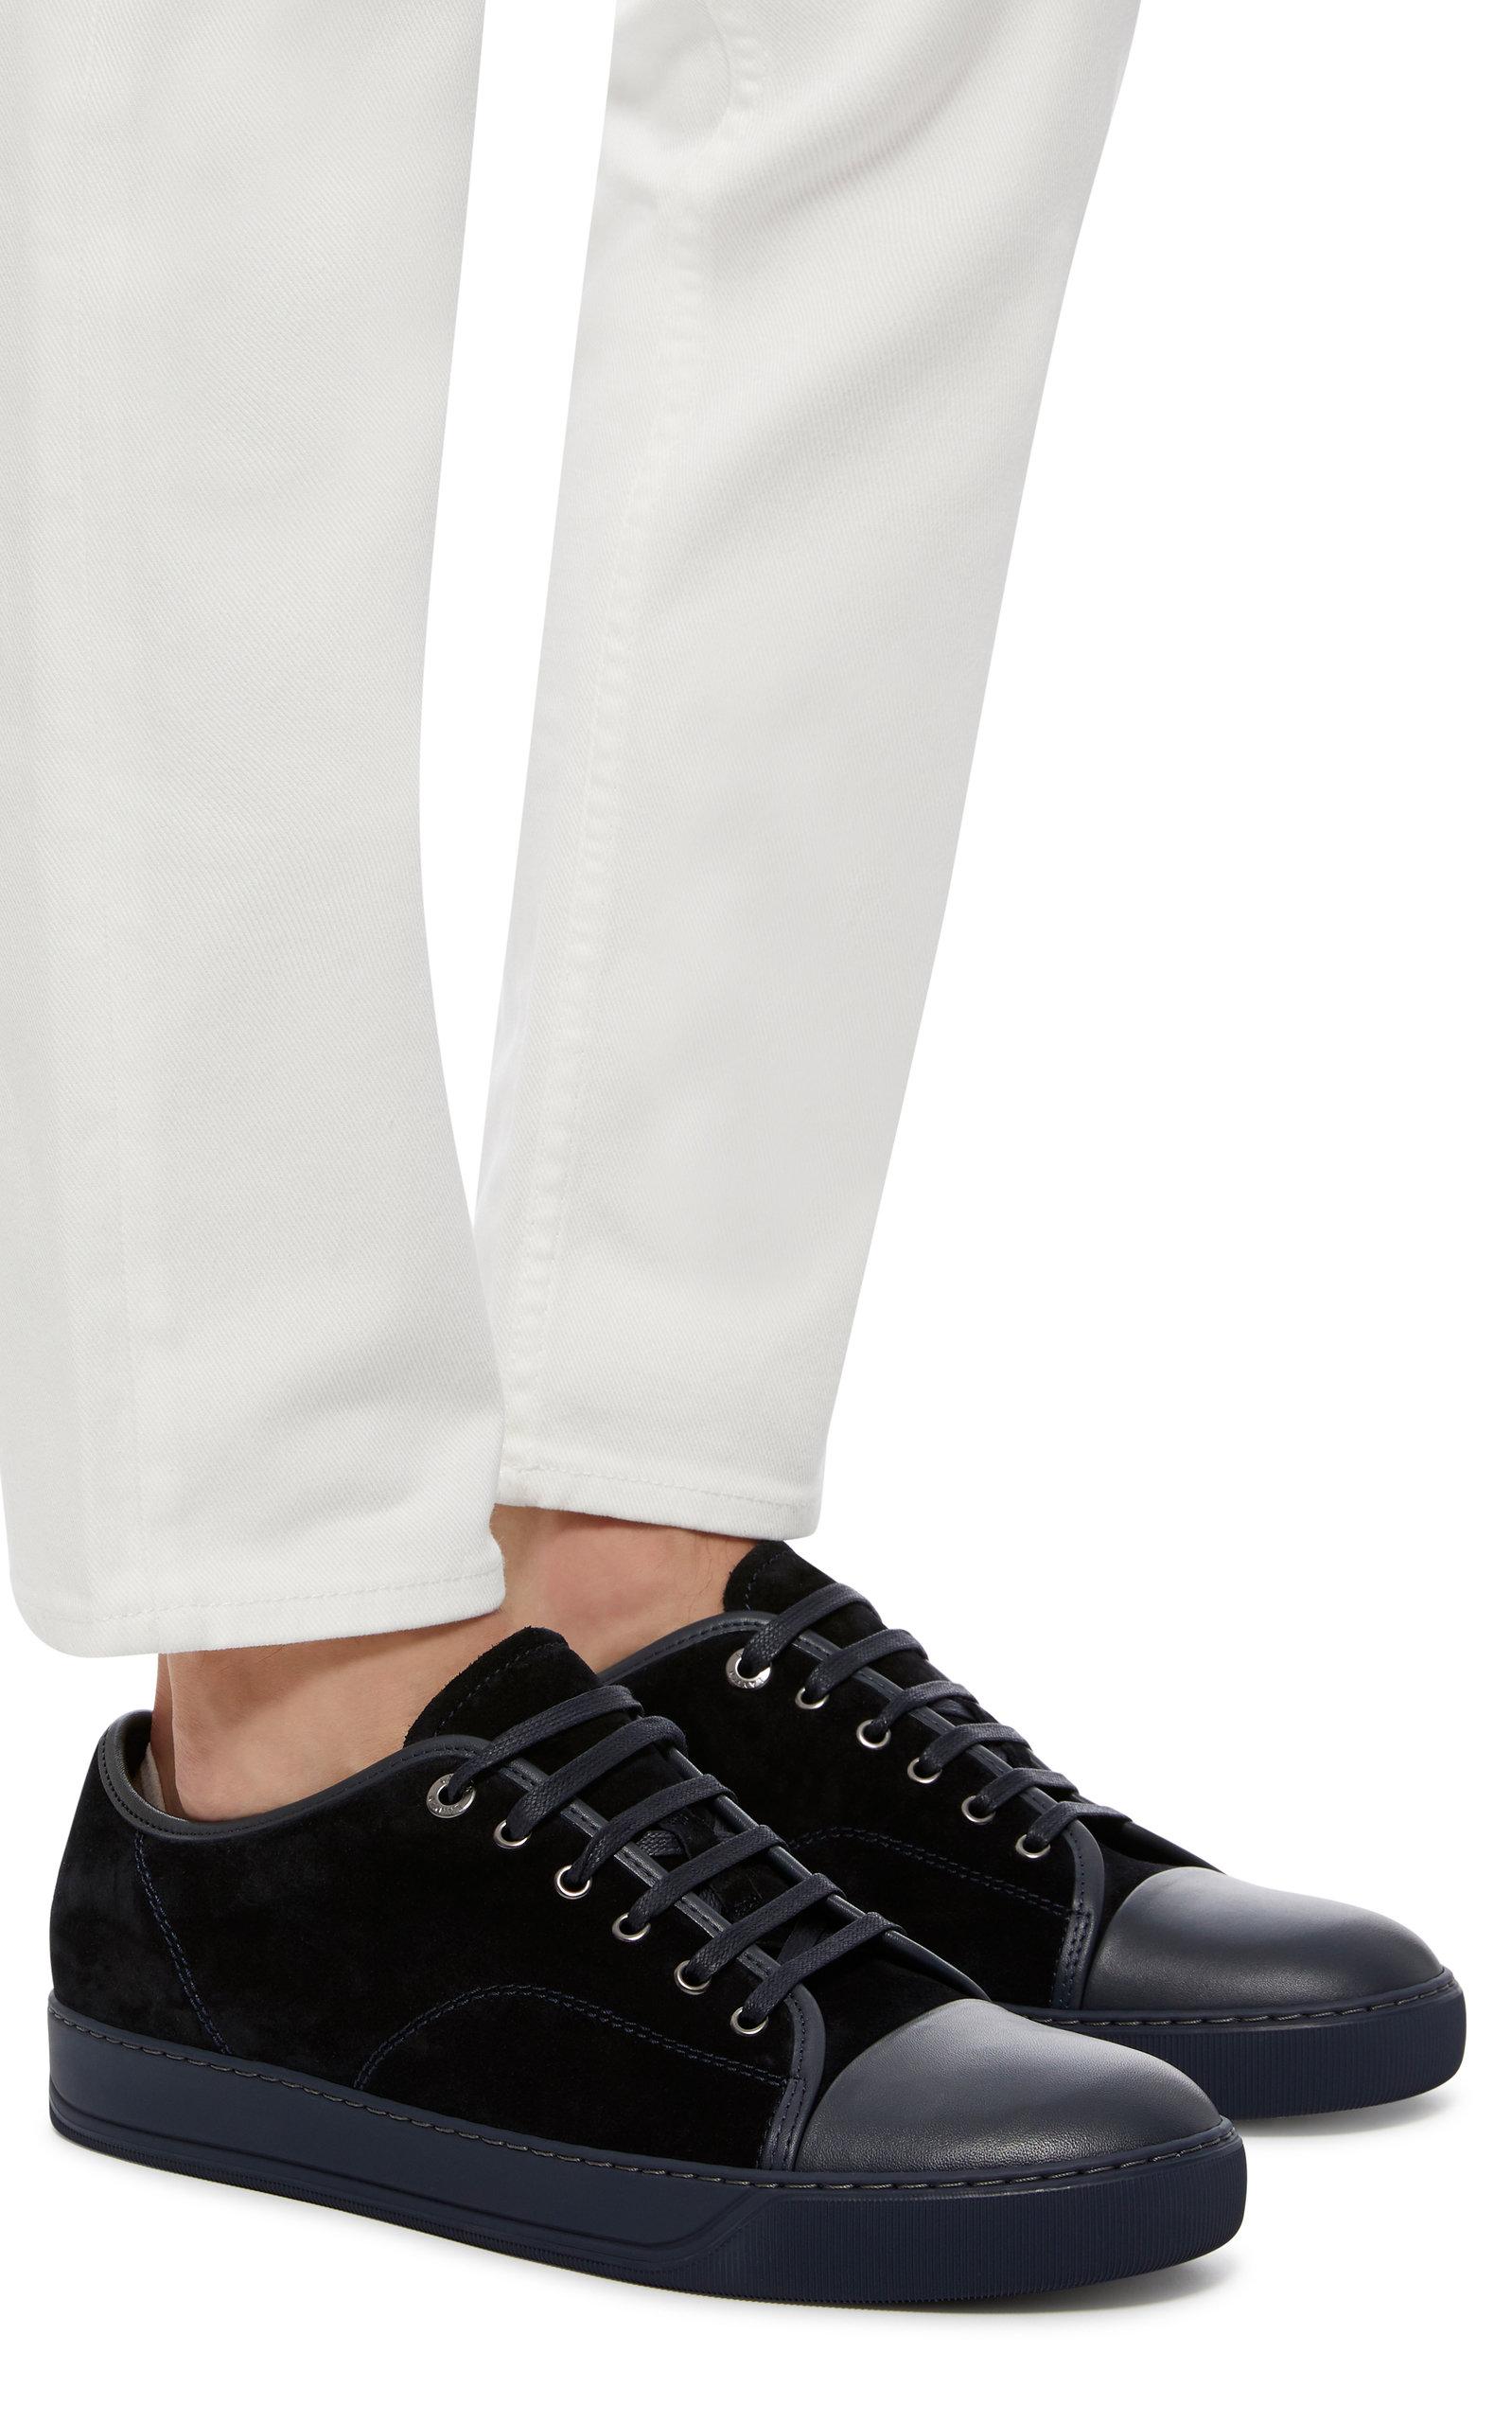 d47dc9fa0607 LanvinSuede Cap-Toe Sneakers. CLOSE. Loading